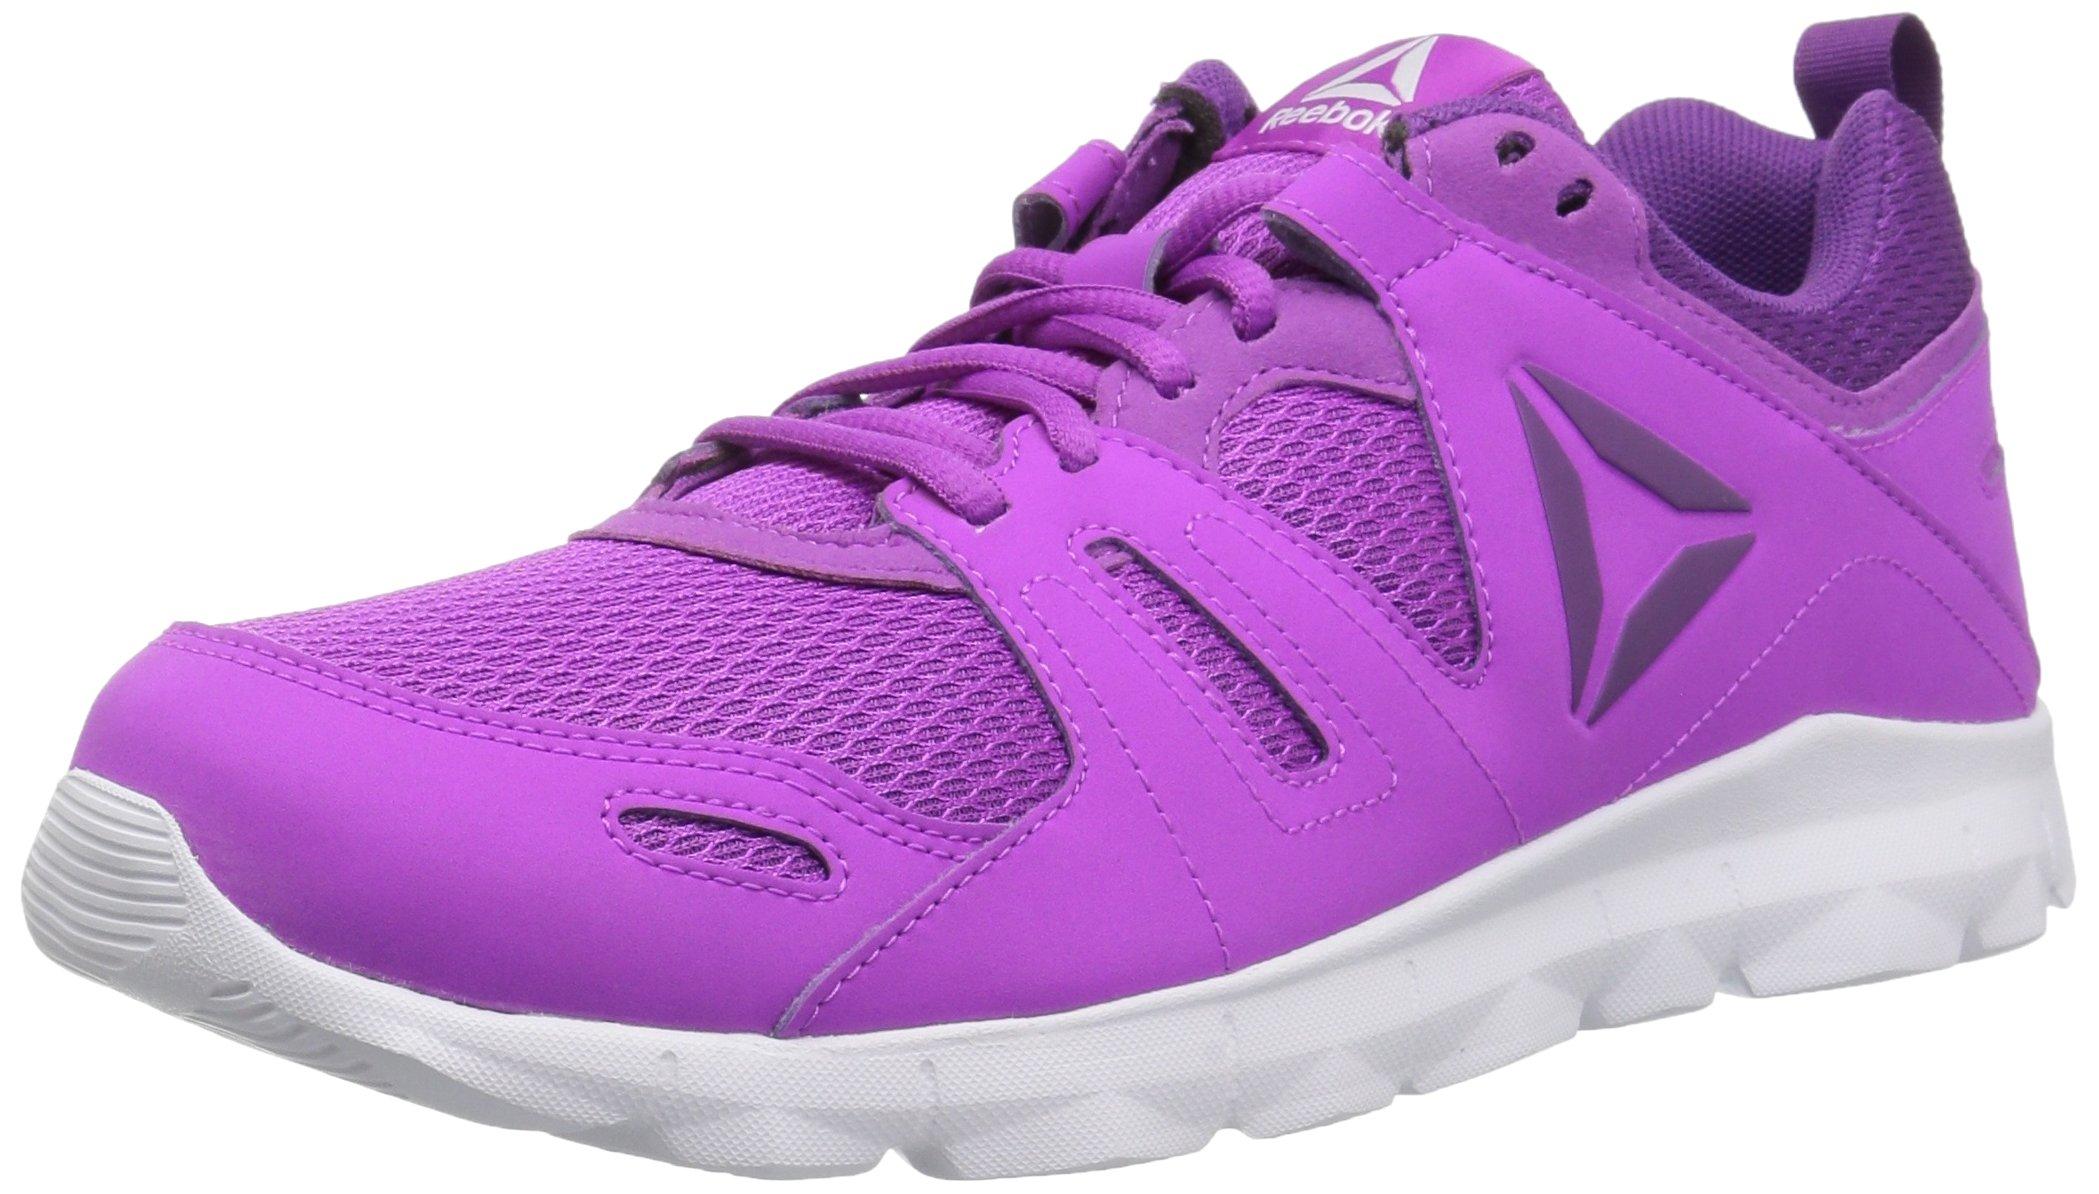 Reebok Women's Dashex TR 2.0 Track Shoe, Vicious Violet/White/Aubergine, 10 M US